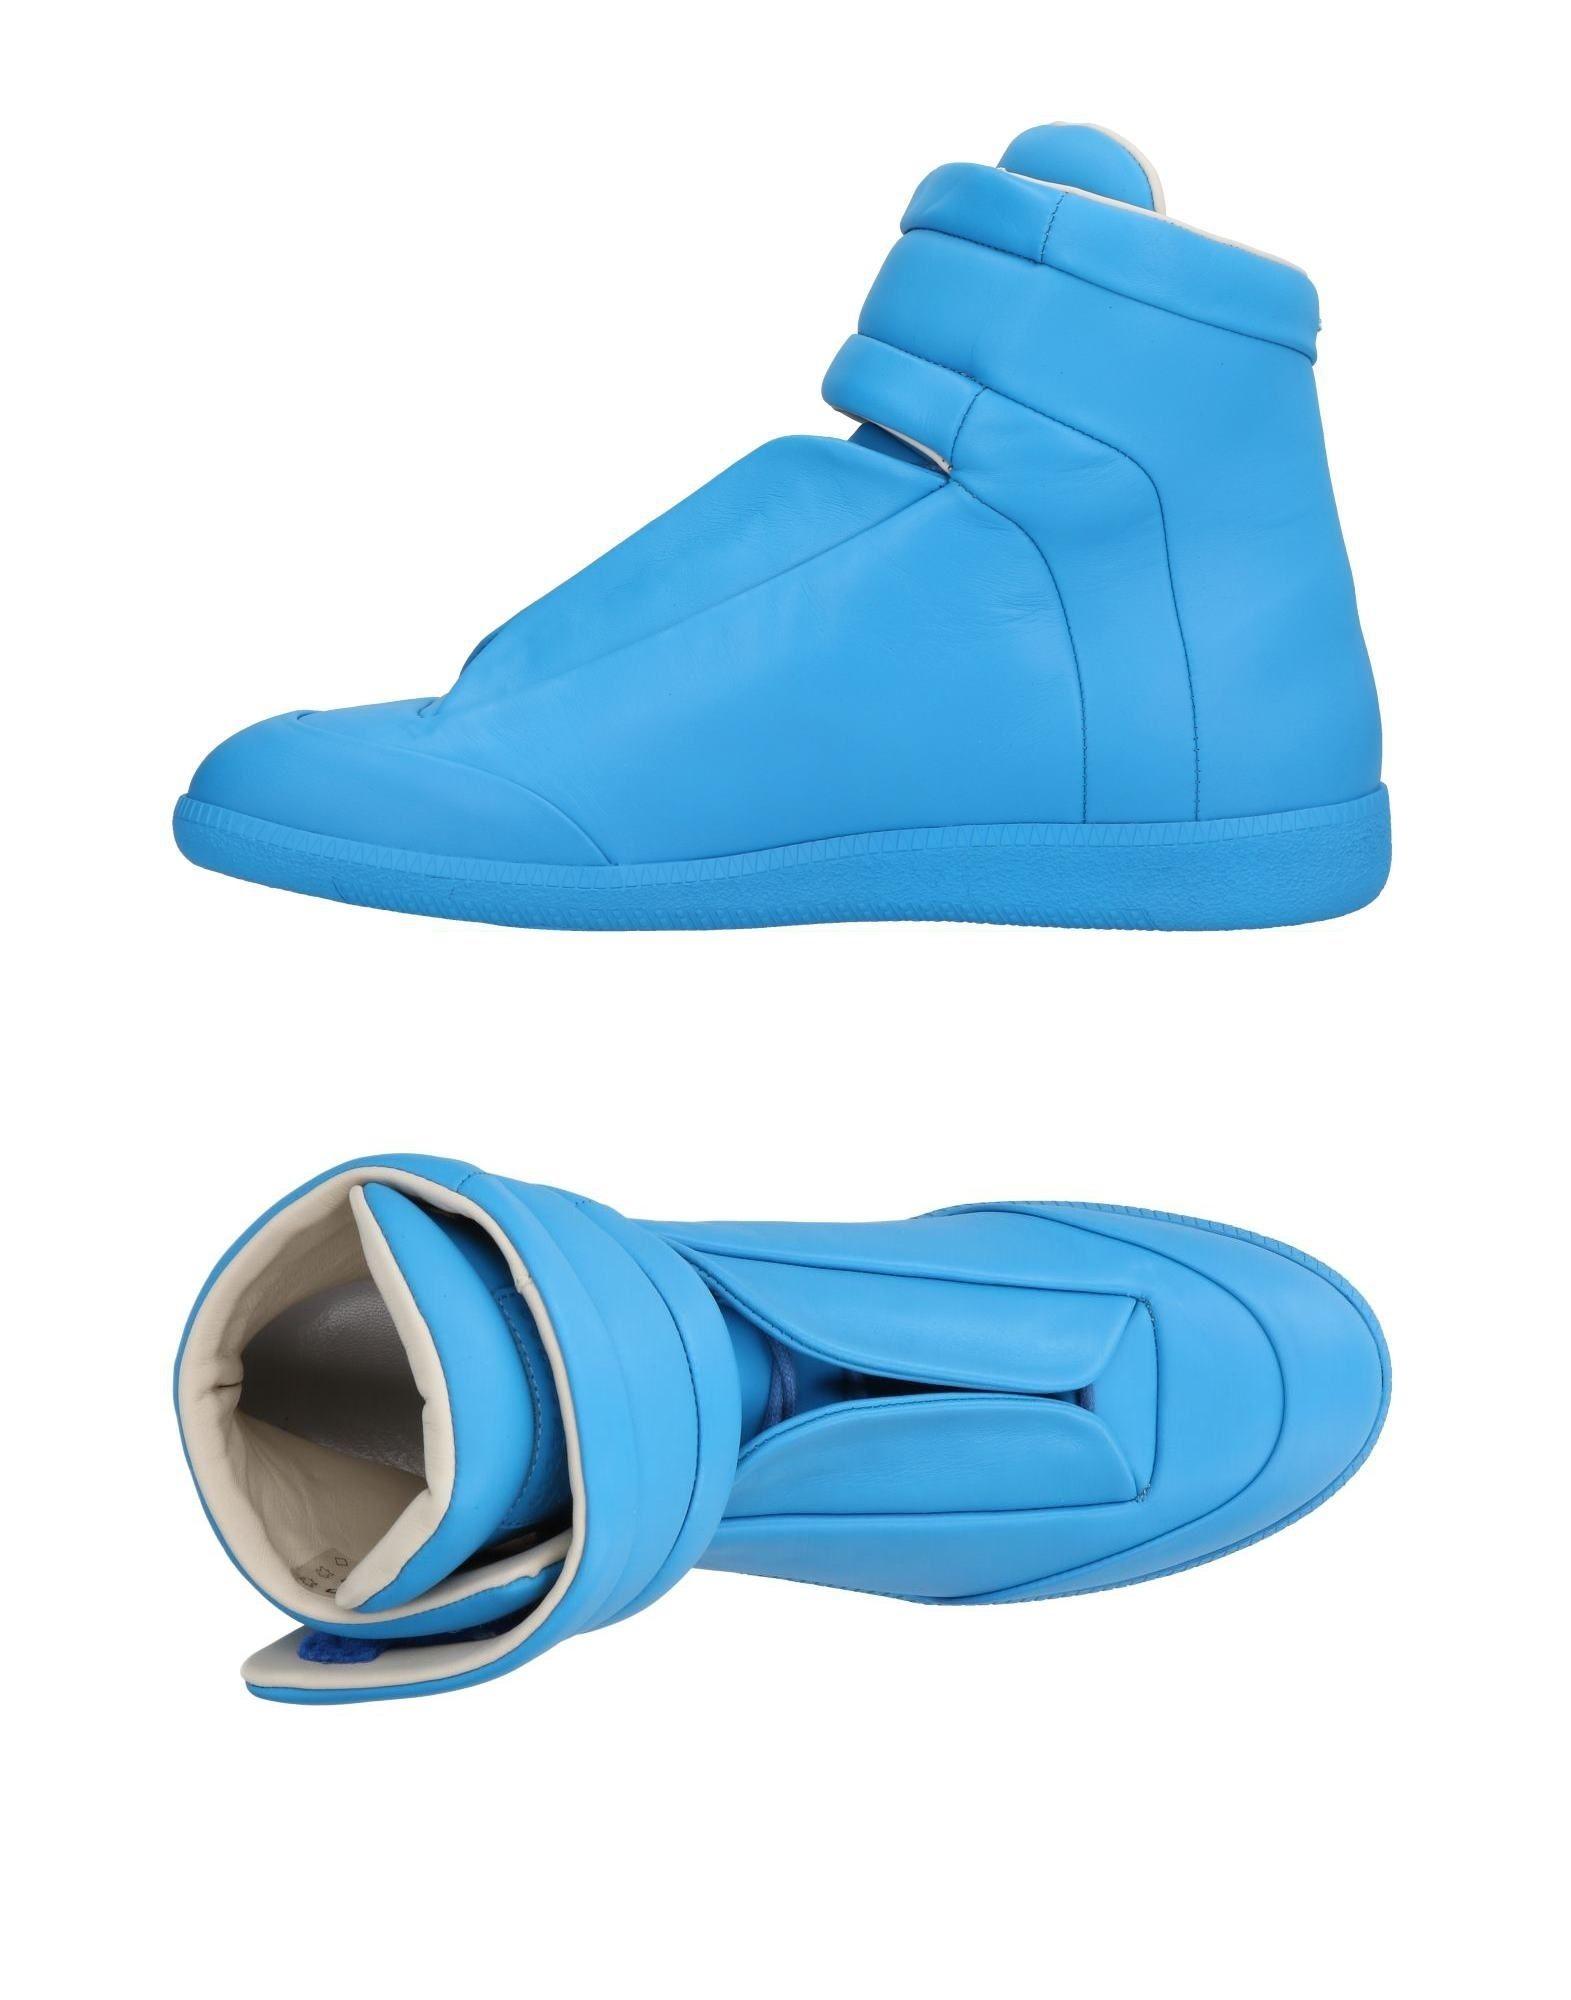 Maison Margiela Sneakers Herren  11472015EP Gute Qualität beliebte Schuhe